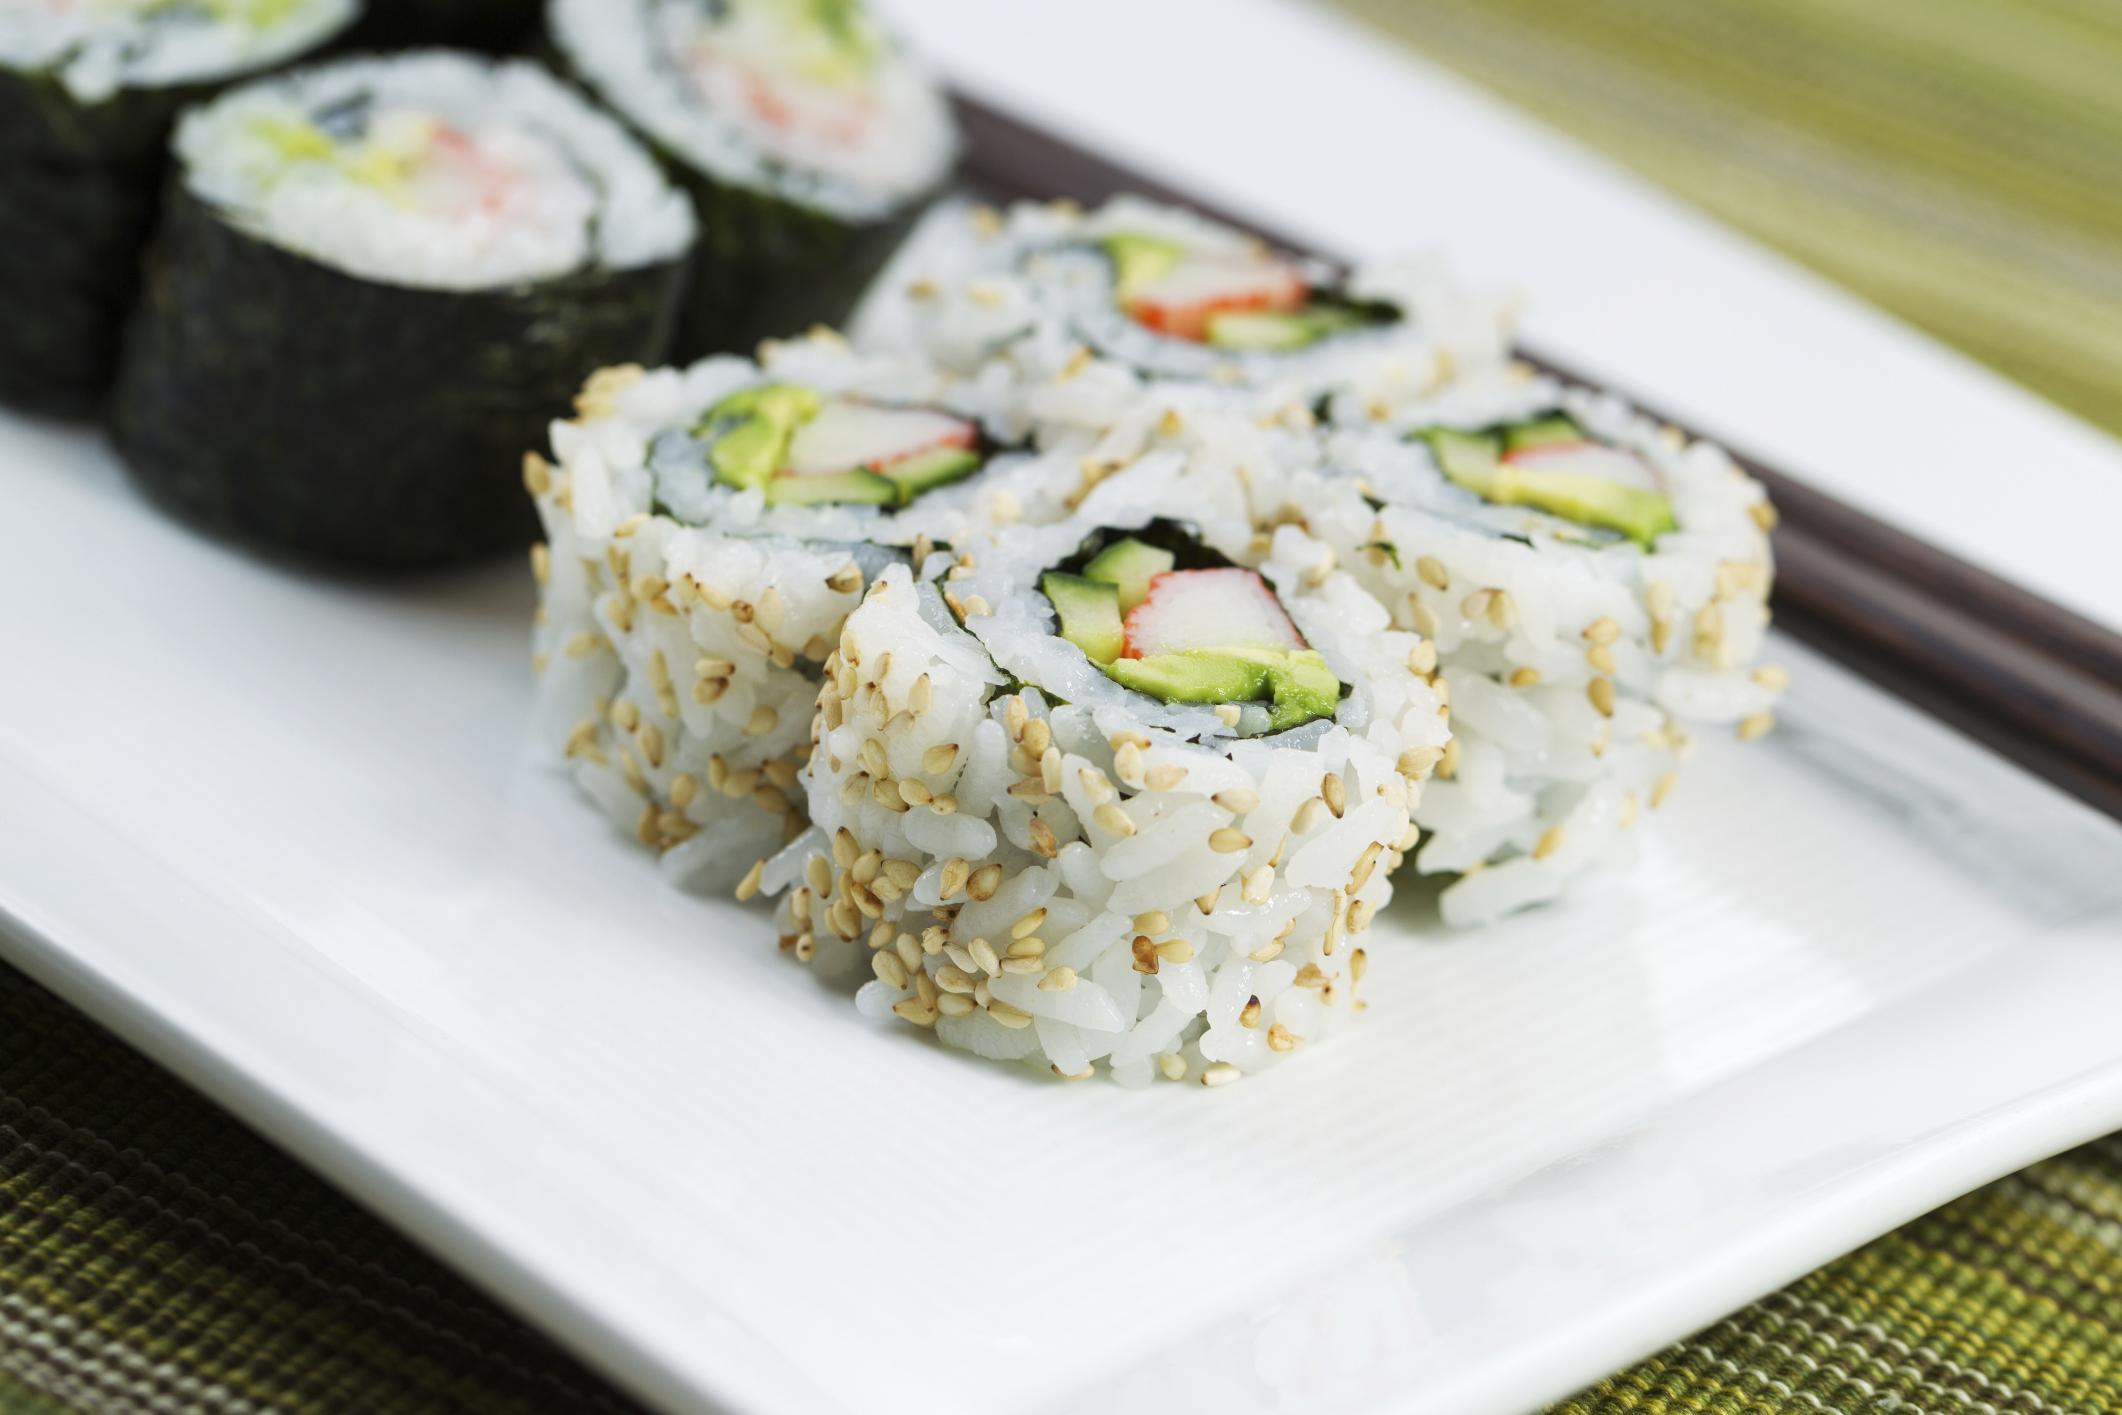 Nutritional Information on Publix Sushi